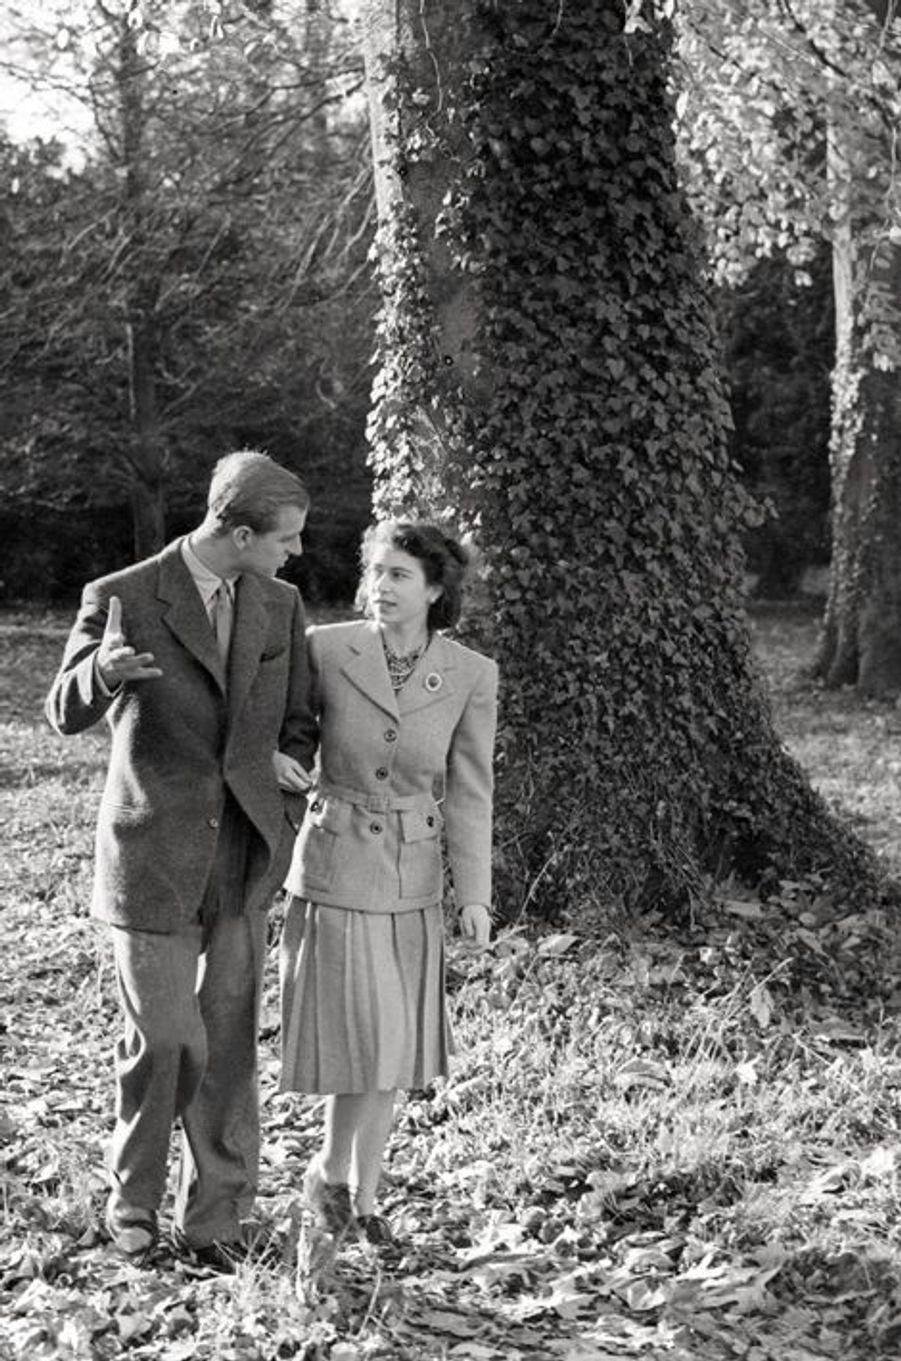 La princesse Elizabeth avec le prince Philip, en novembre 1947